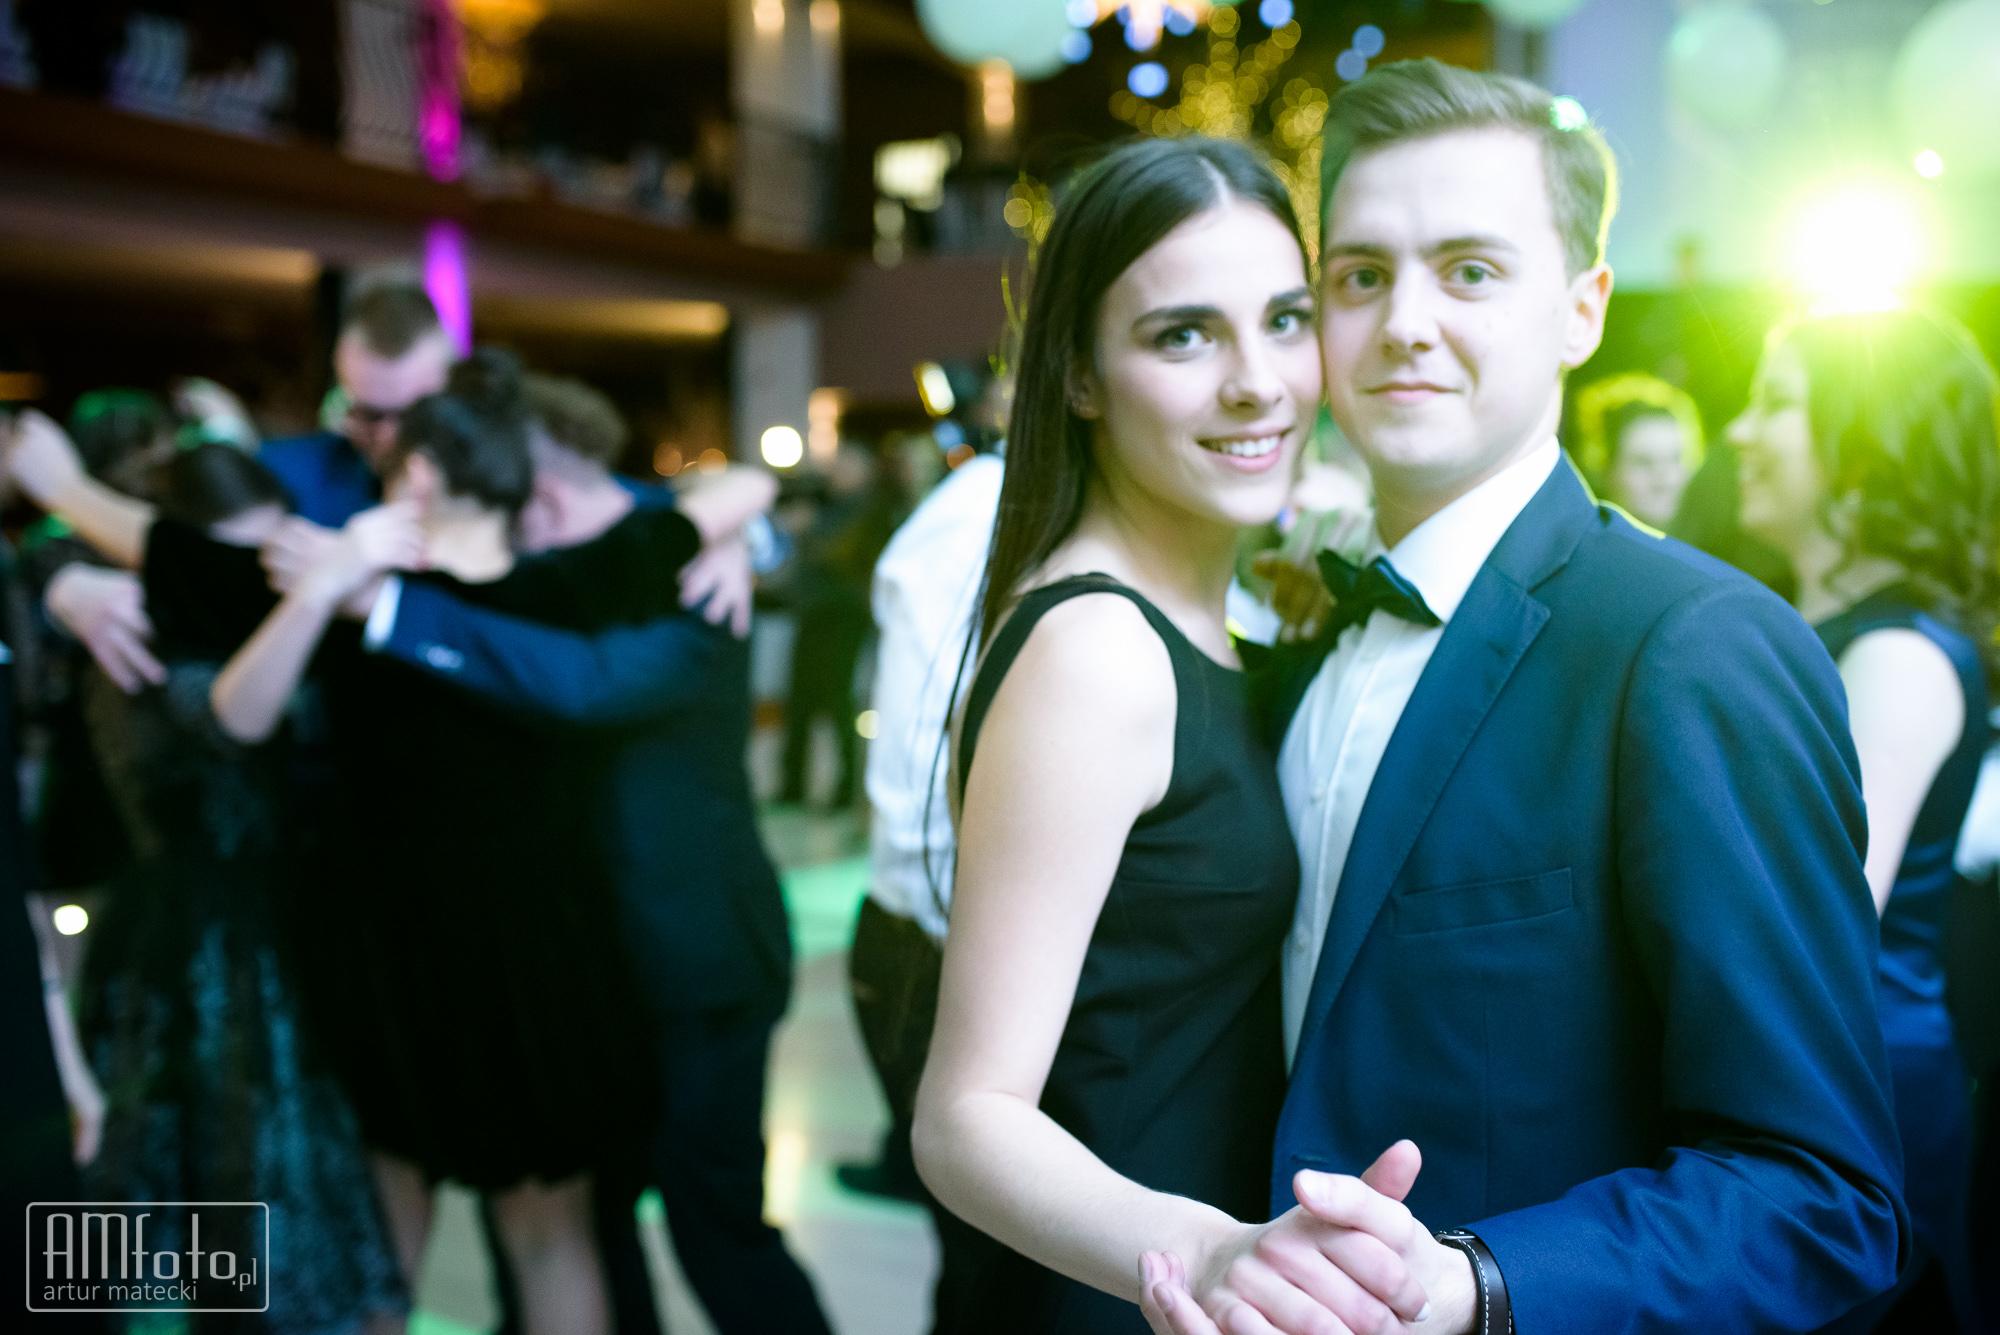 studniowka_2017_3LO_Kalisz_reportaz__www_amfoto_pl-0871.jpg